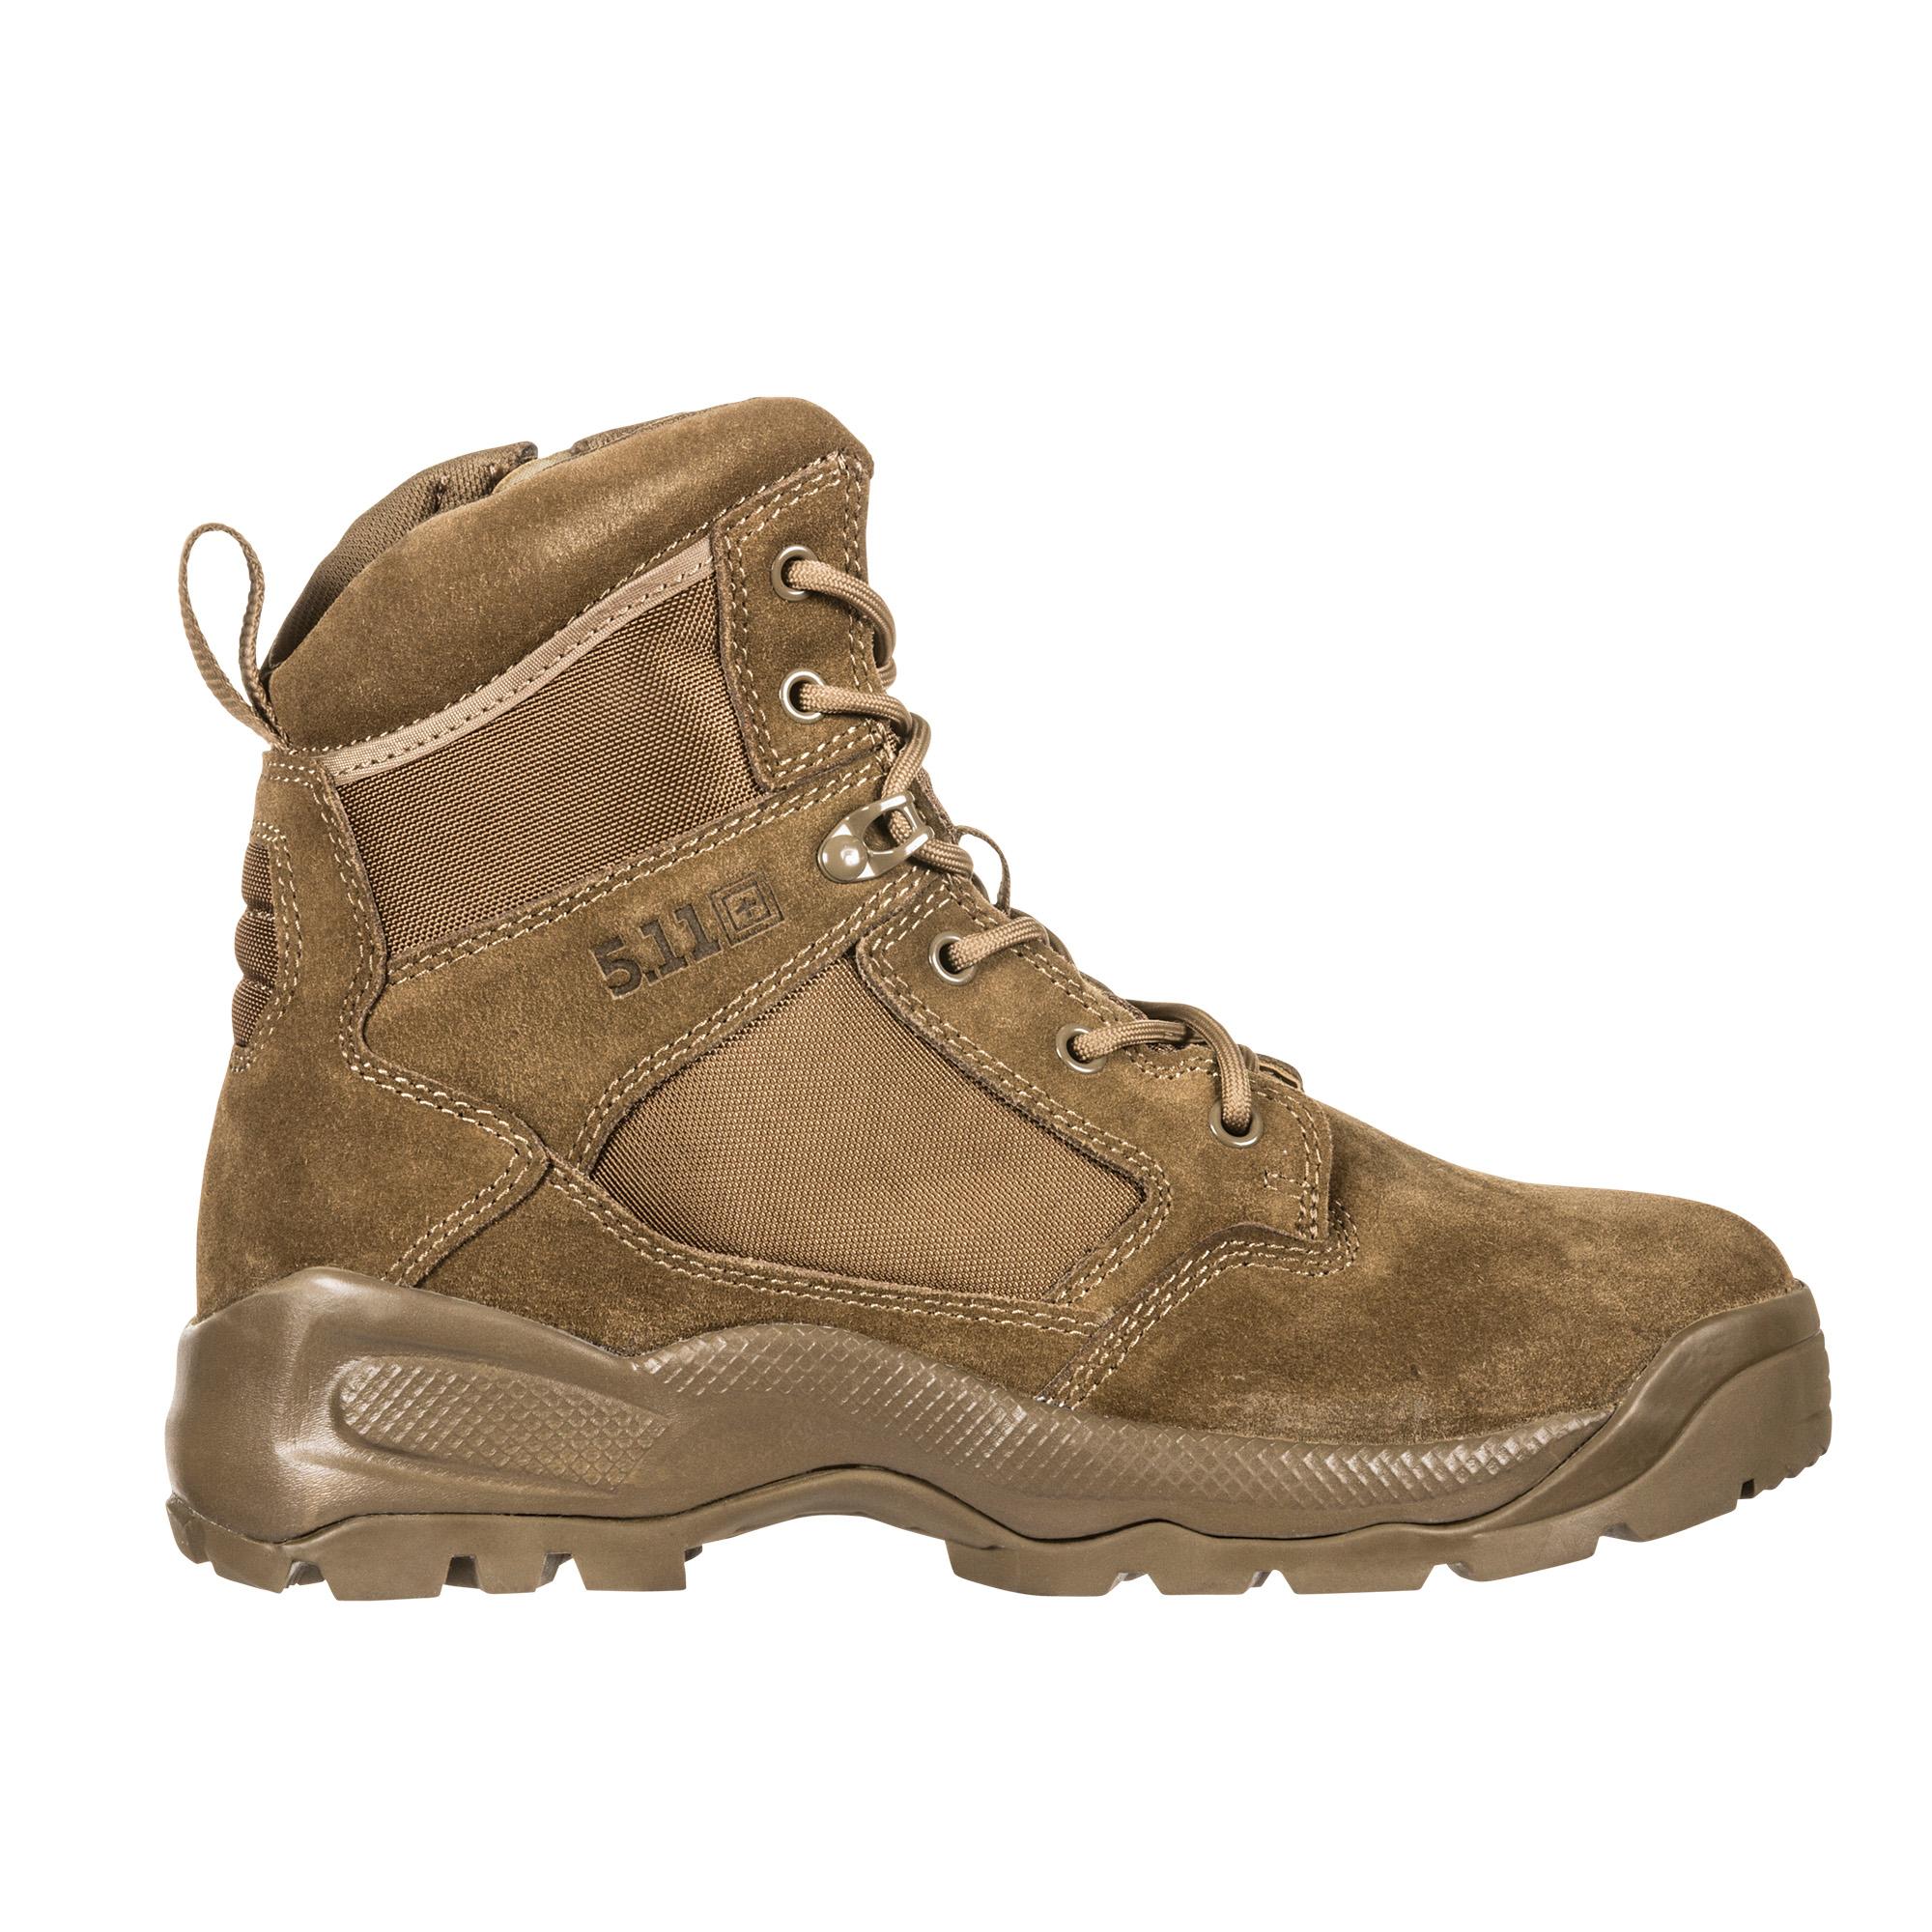 5.11 Tactical Mens Atac 2.0 6 Desert Side Zip Boot-5.11 Tactical